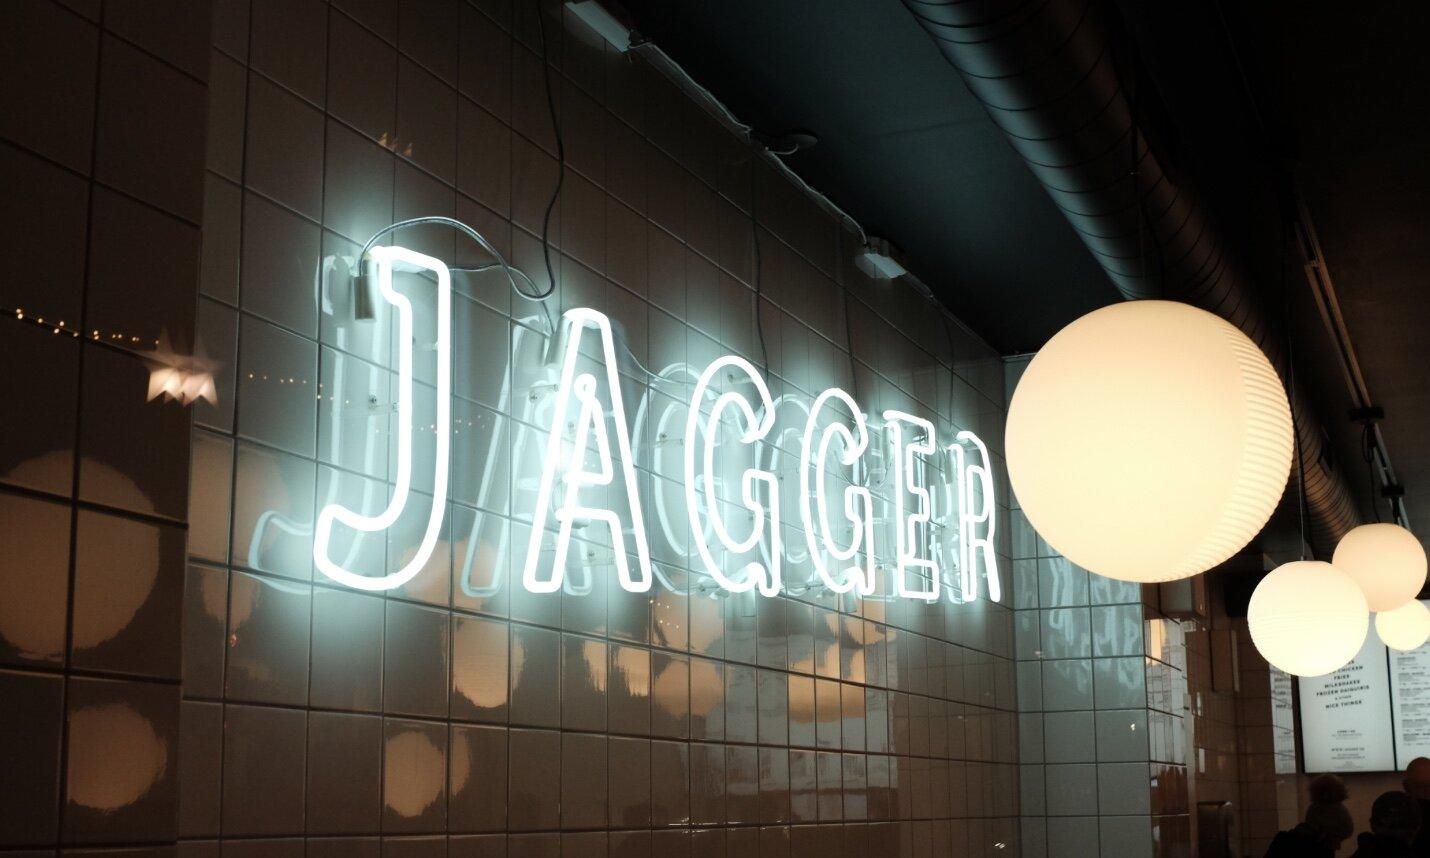 jagger_osterbro (2).jpeg